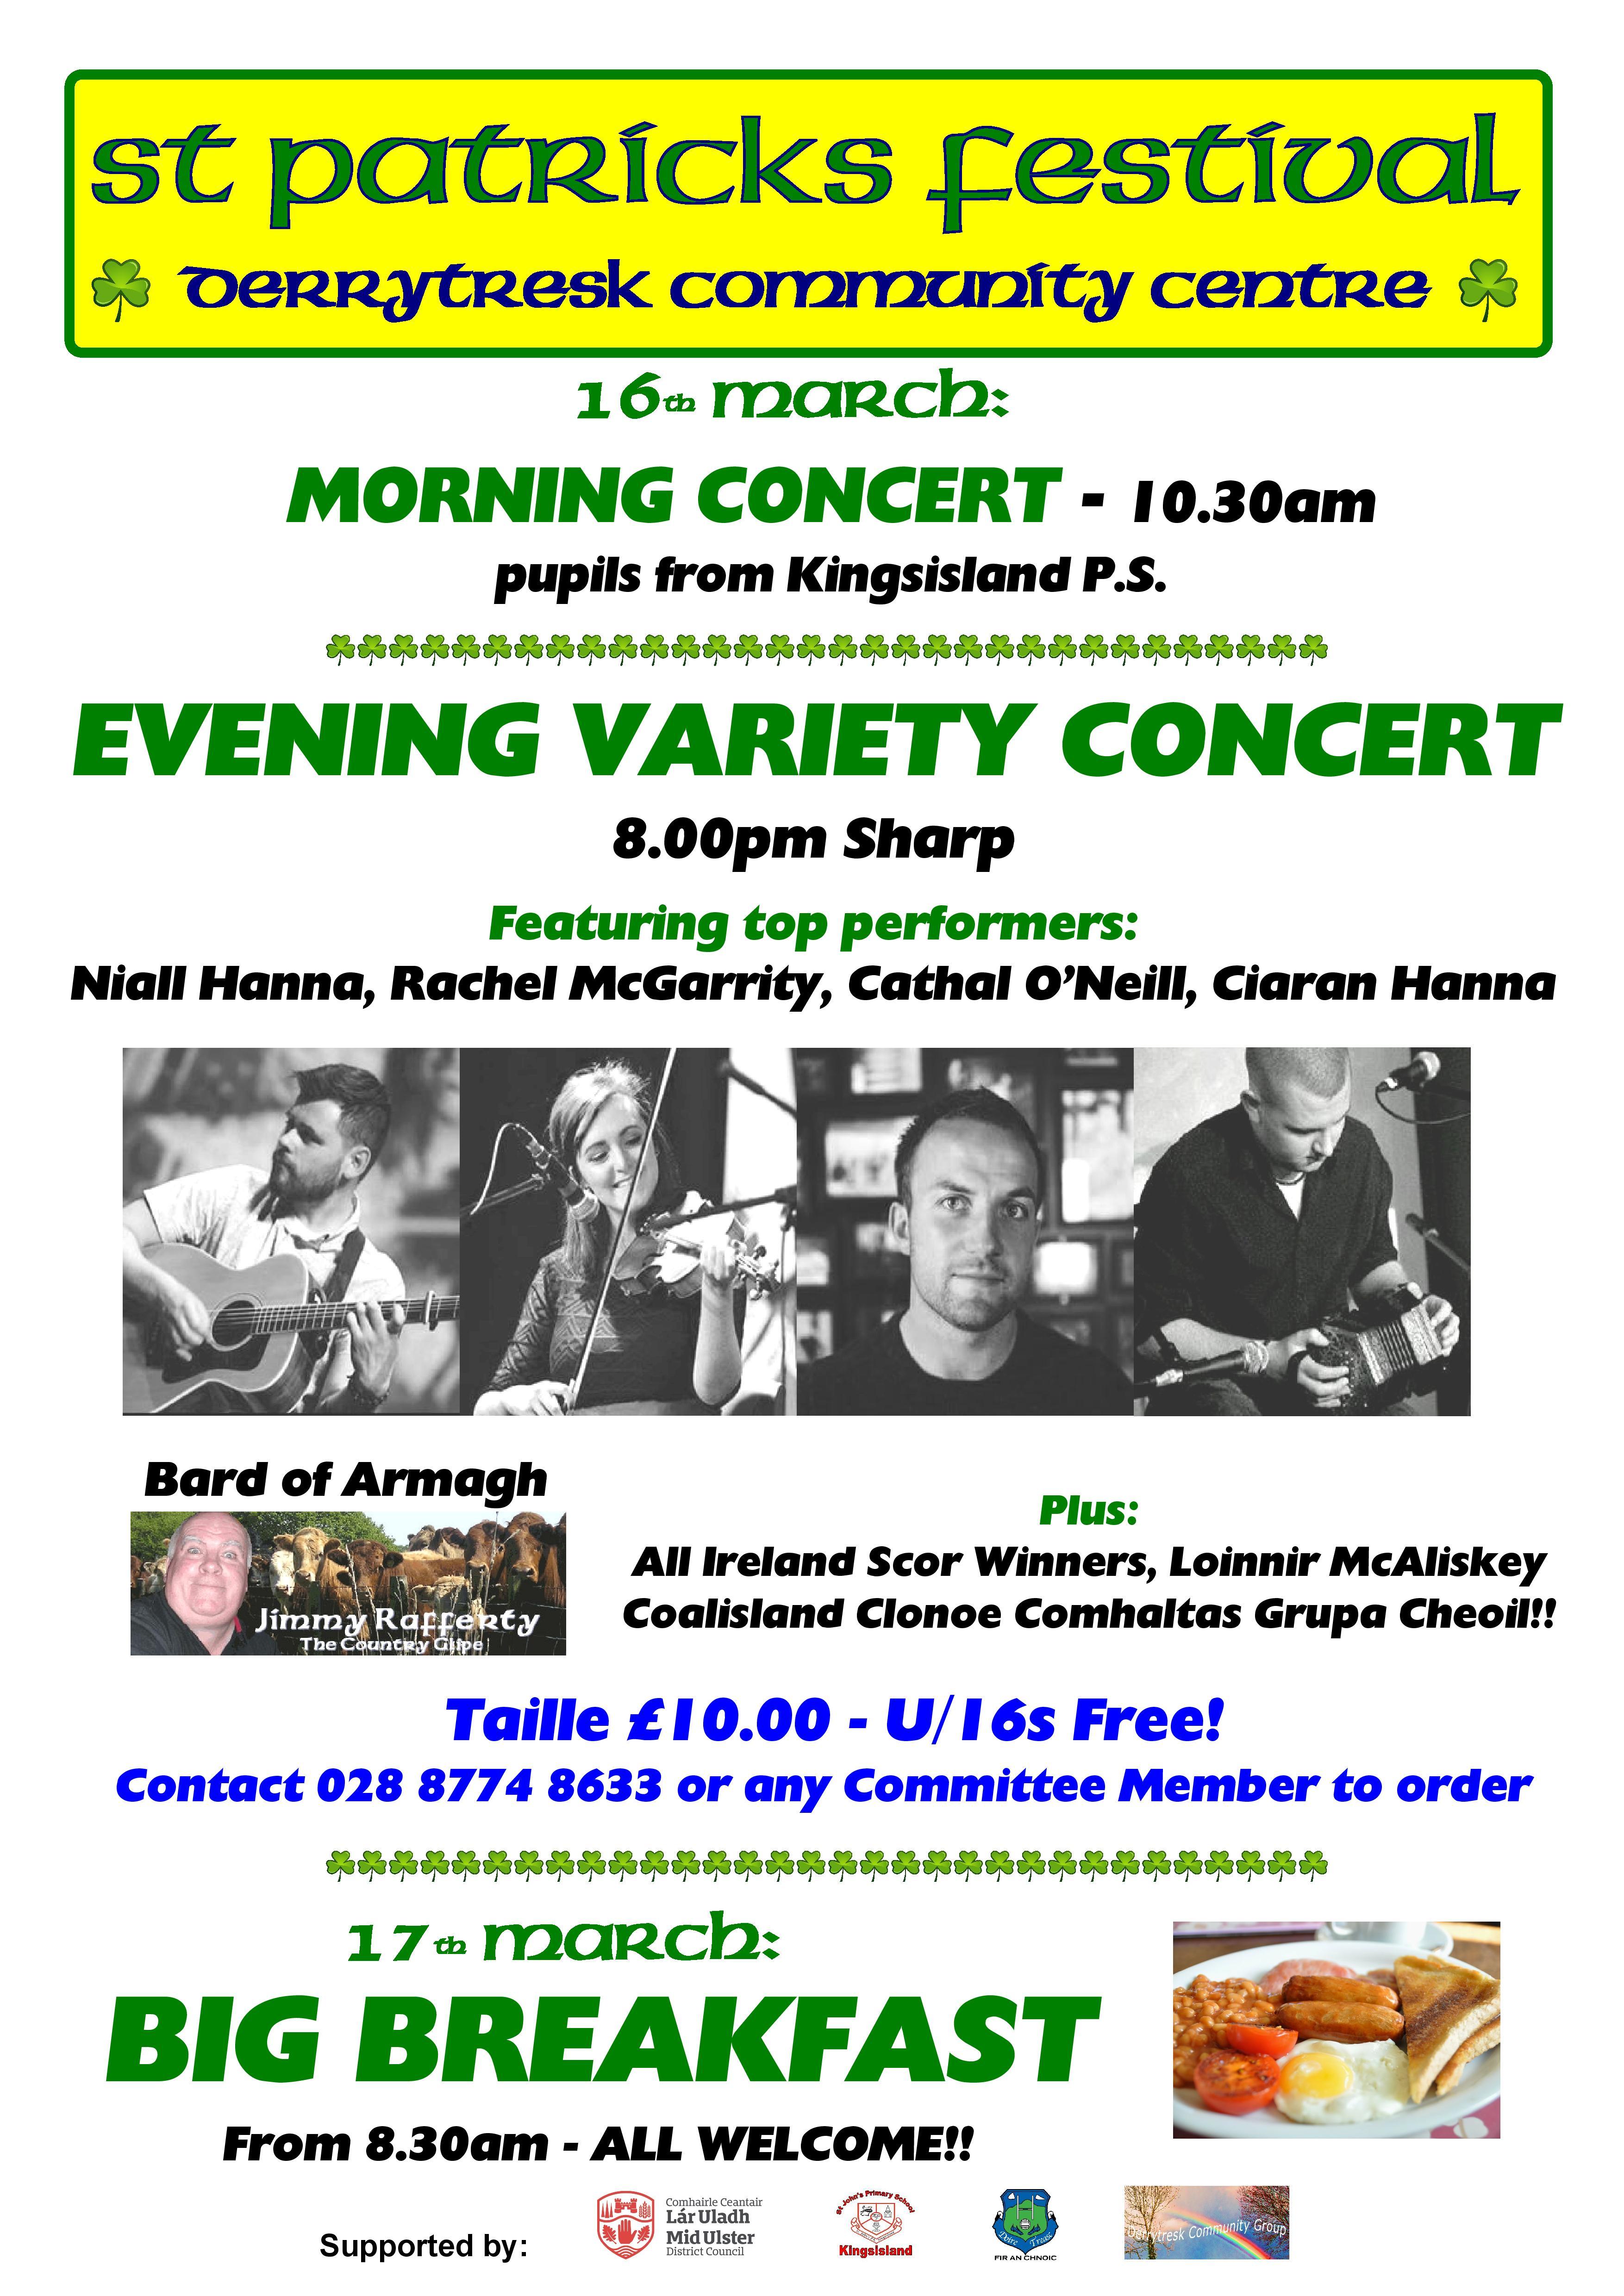 Derrytresk to host St Patrick's Festival